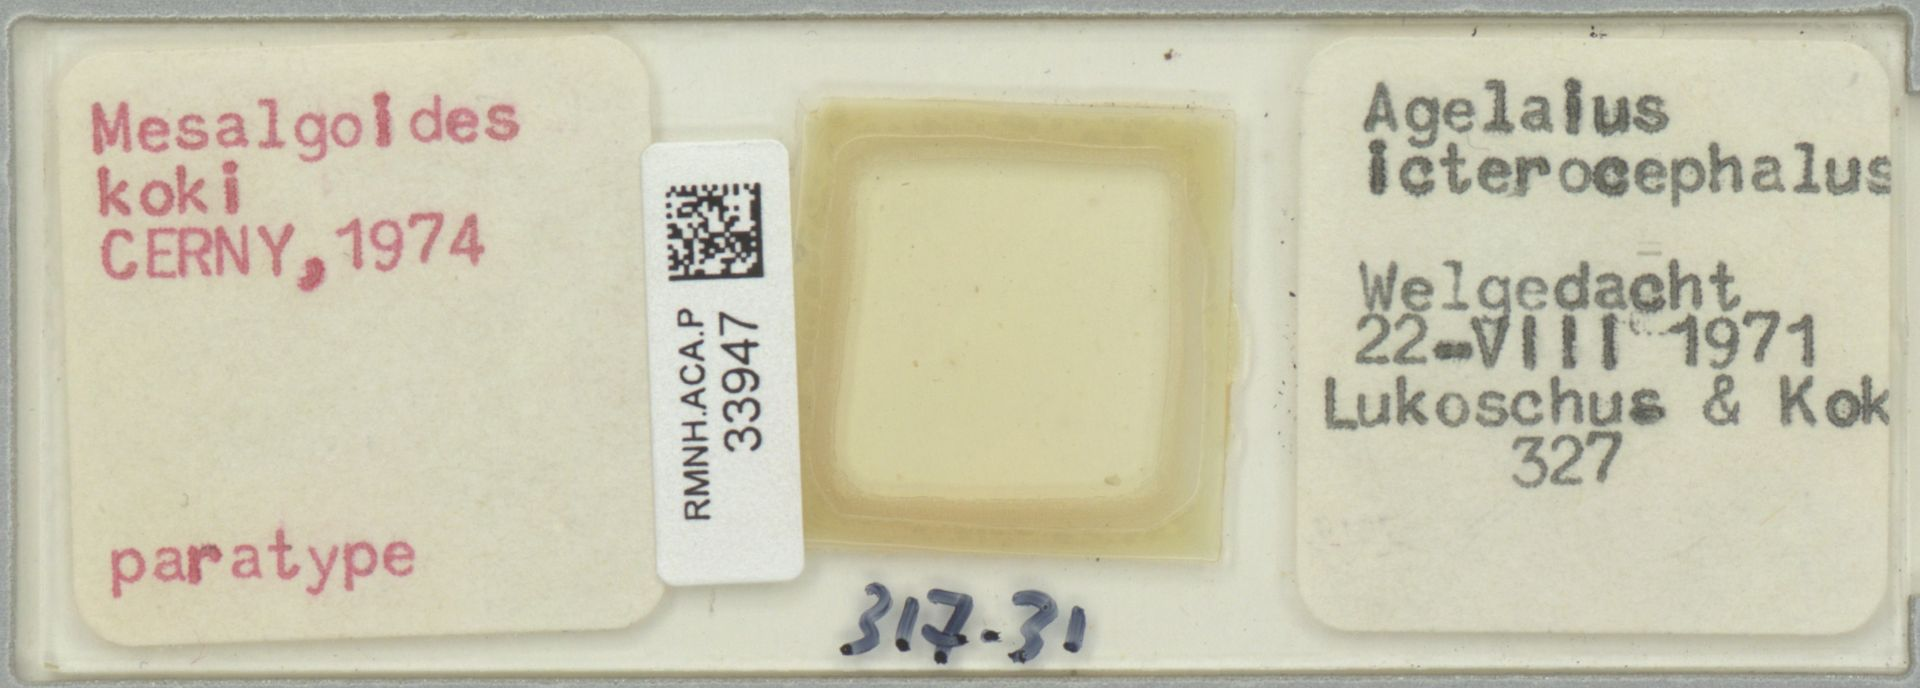 RMNH.ACA.P.33947 | Mesalgoides koki CERNY, 1974